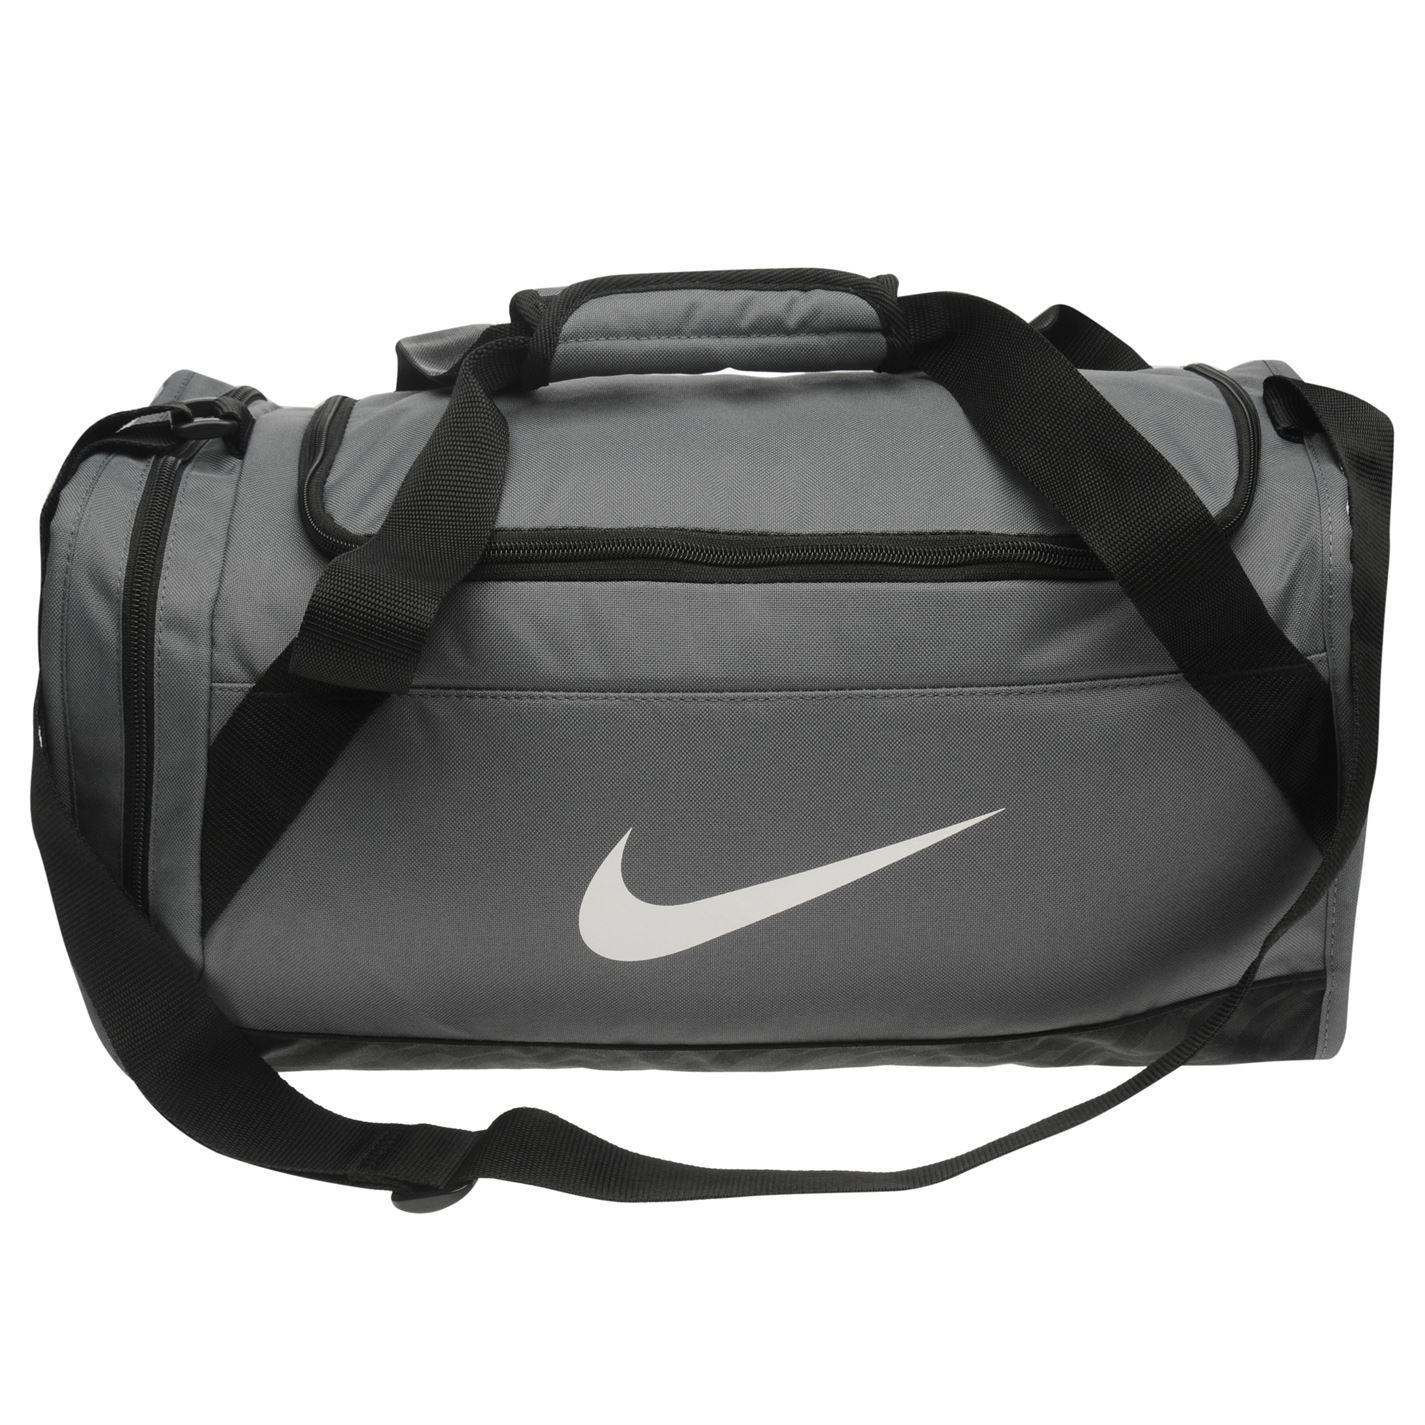 8a11033c58 ... Nike Brasilia presa piccola sport Holdall grigio palestra Kit Borsa  Carryall ...